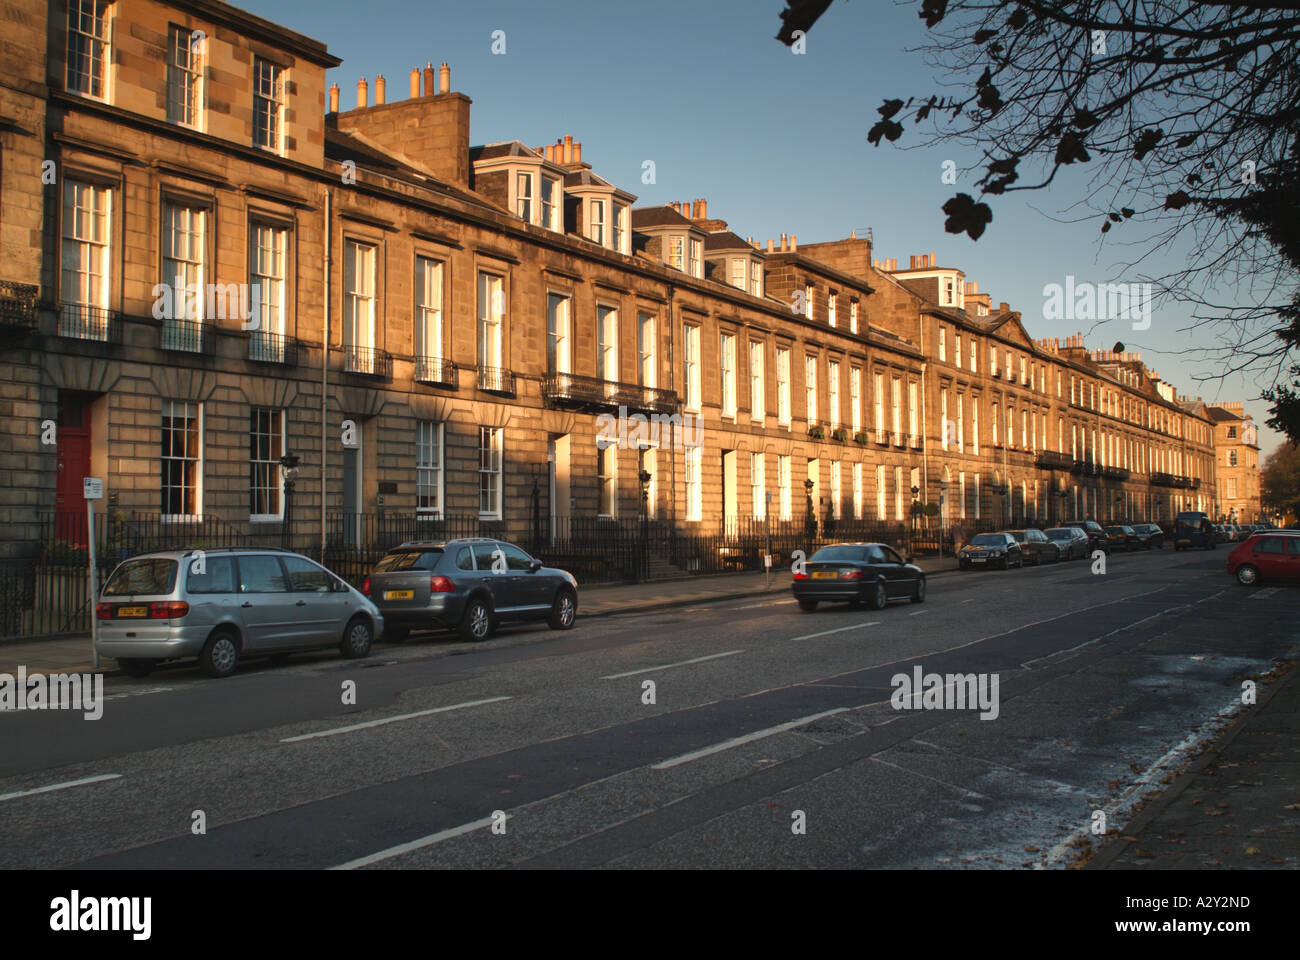 Heriot Row, New Town, Edinburgh, Scotland, UK. Stock Photo